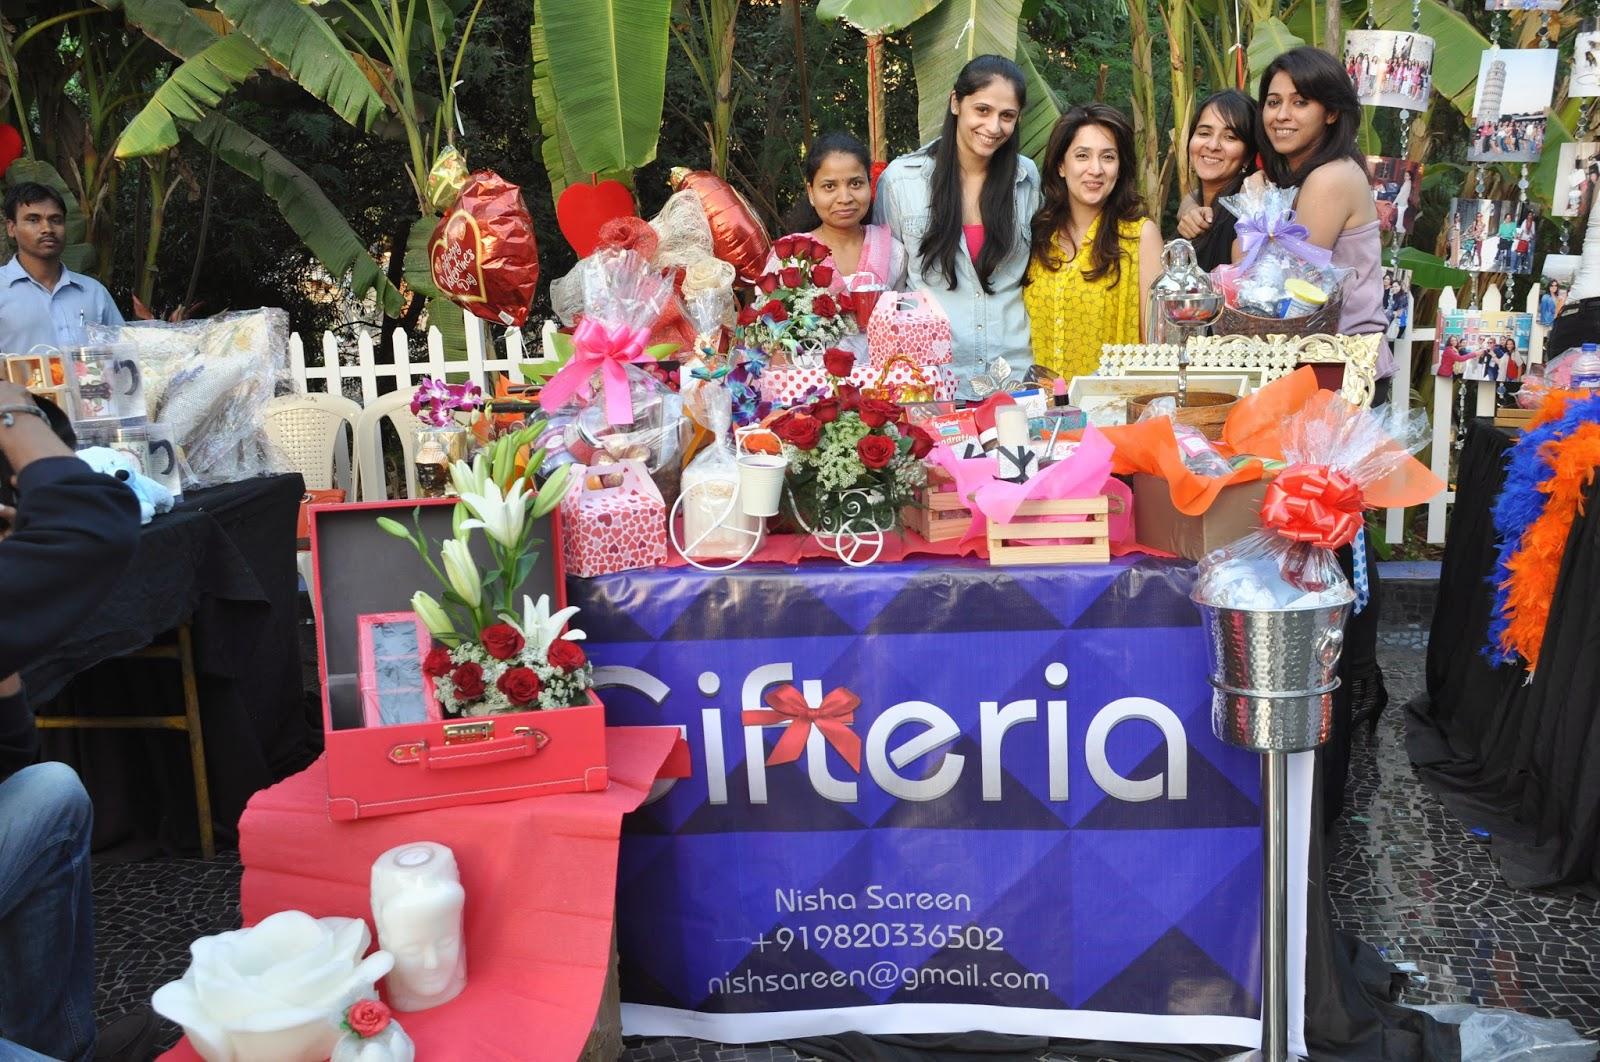 Nisha Sareen's Gifteria at Villa 69